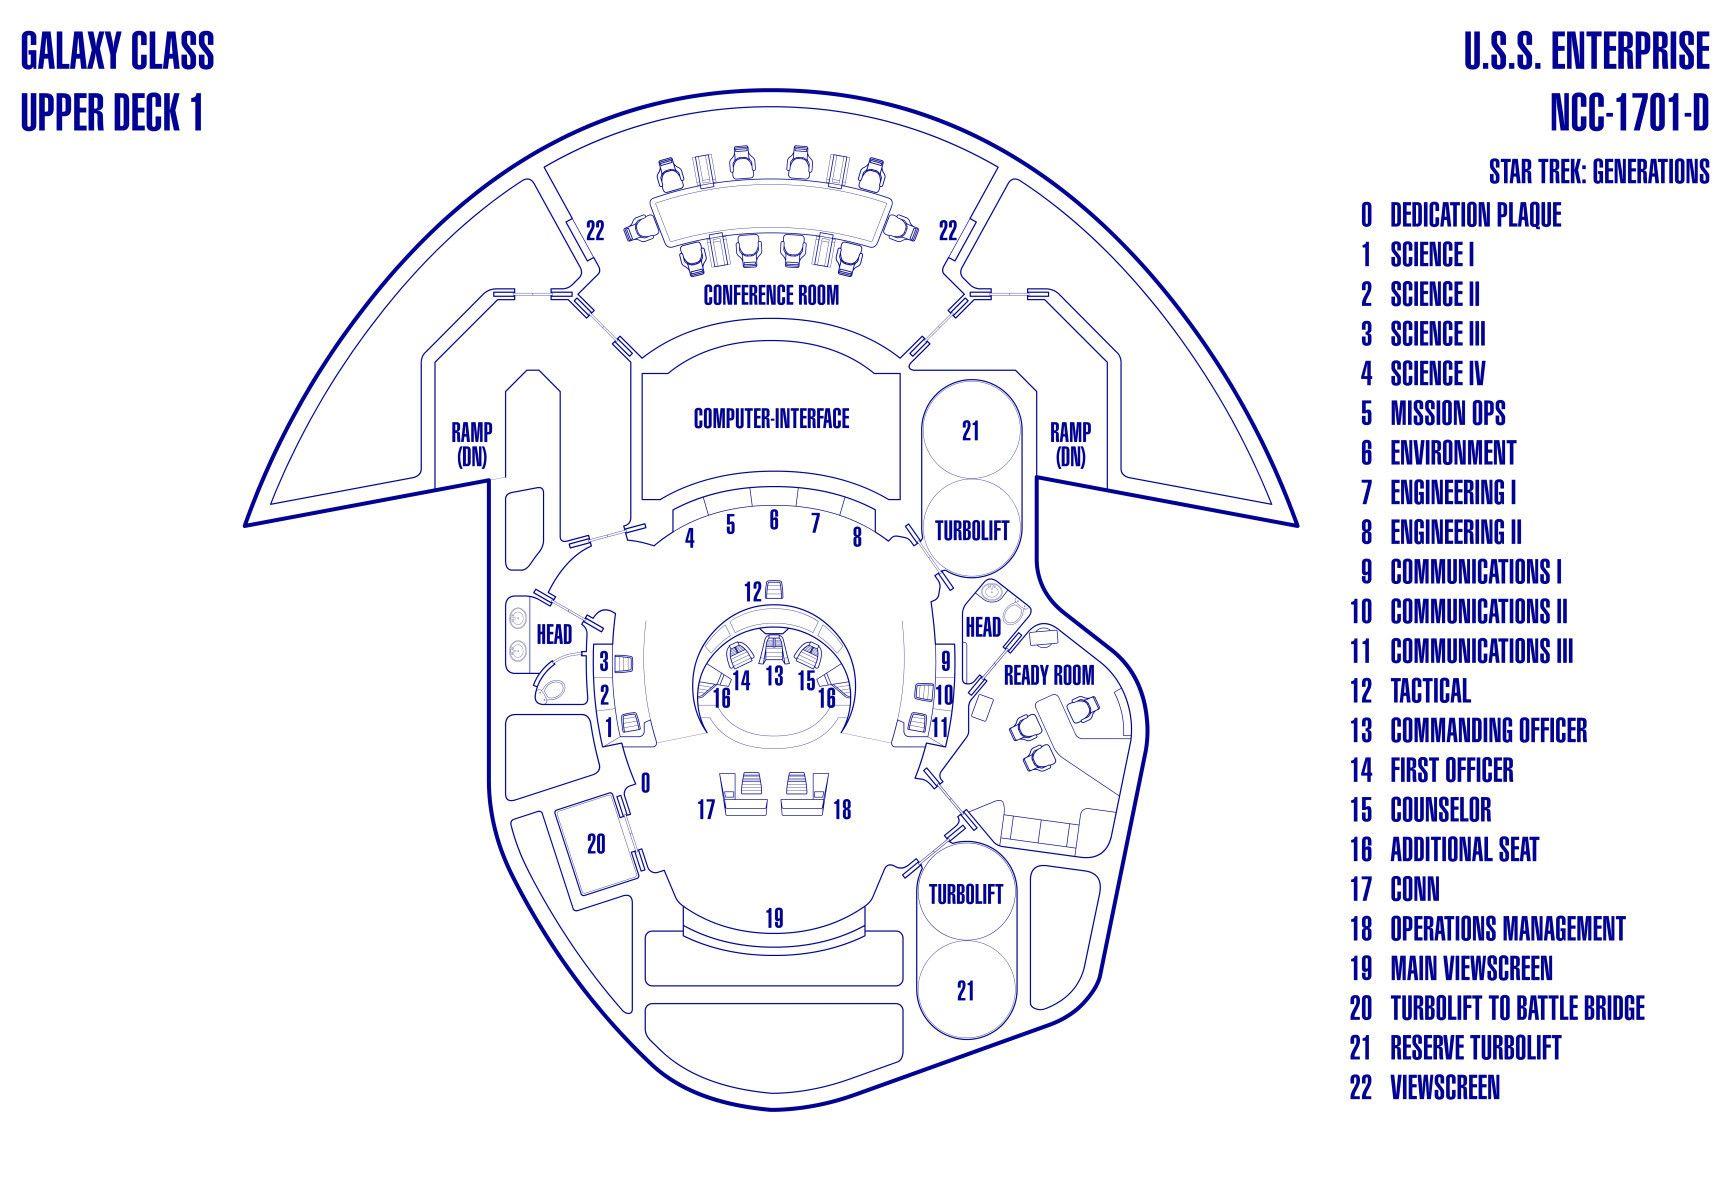 Uss Enterprise Diagram 2001 Nissan Altima Belt D Schematics Great Installation Of Wiring Deck One Schematic U S Ncc 1701 Star Trek Ships Rh Pinterest Com Starship Blueprints